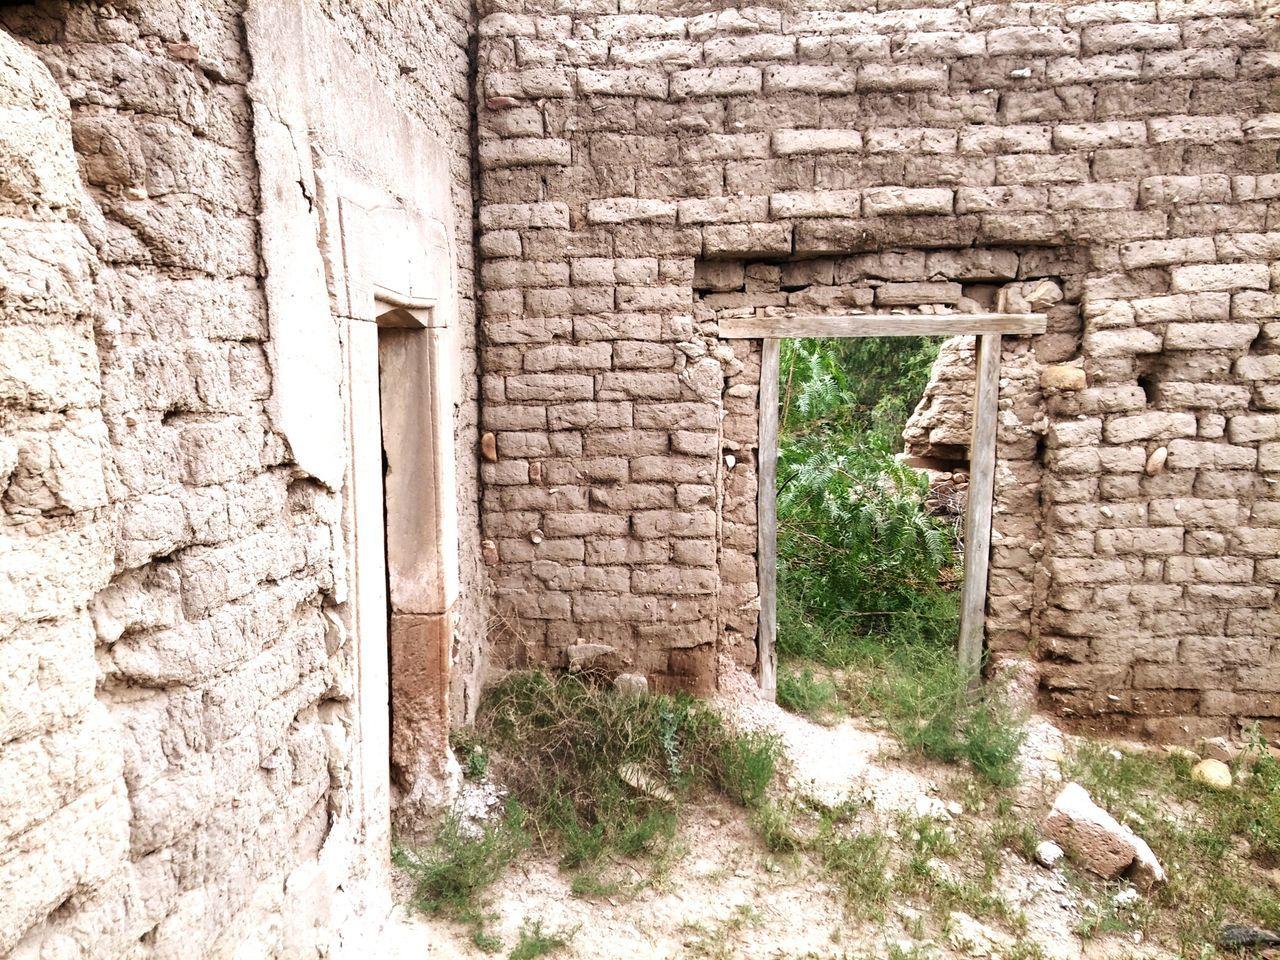 architecture, built structure, abandoned, old, door, entrance, weathered, building exterior, old ruin, no people, open, day, doorway, outdoors, open door, rotting